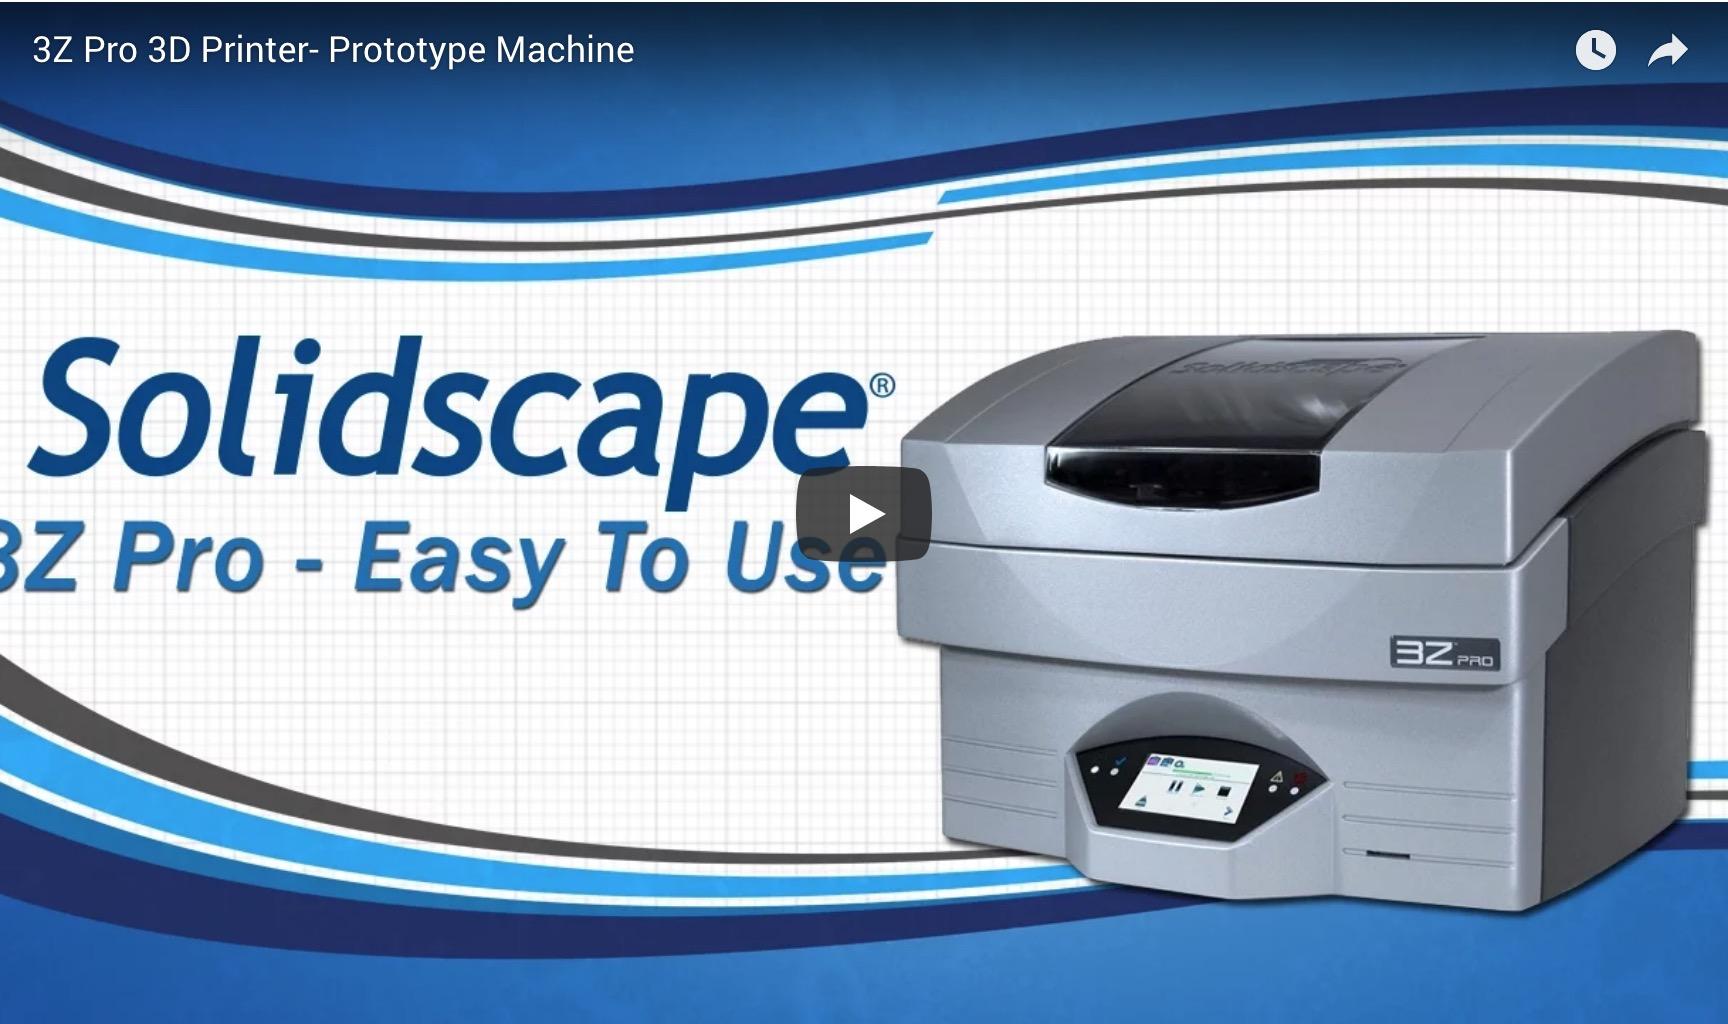 3Z Pro 3D Printer- Prototype Machine